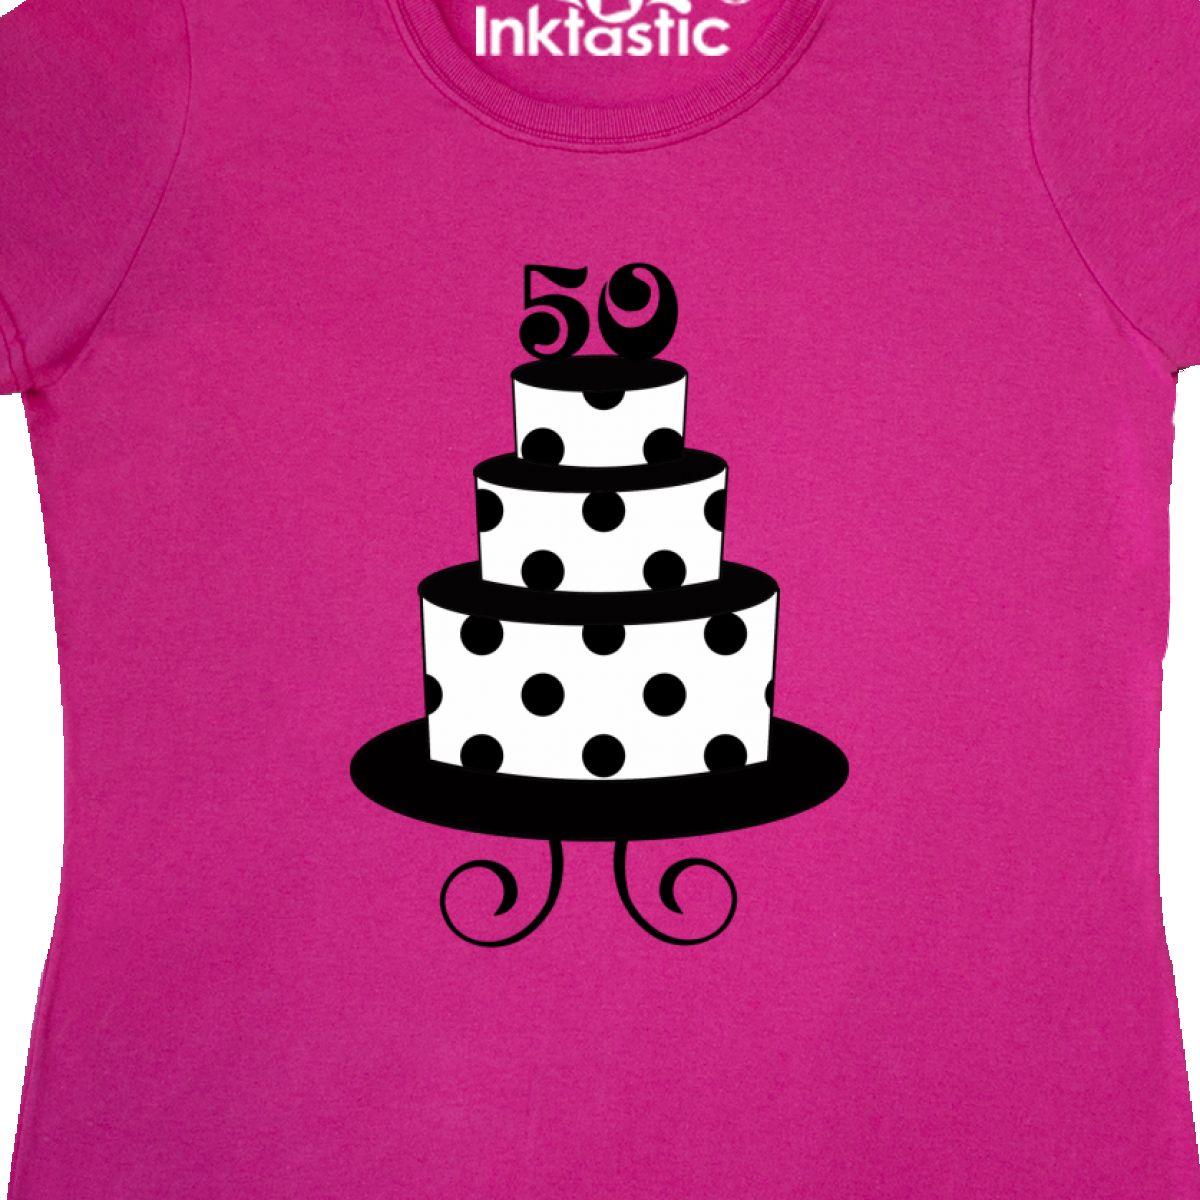 Inktastic 50th Birthday Cake Women 039 S T Shirt